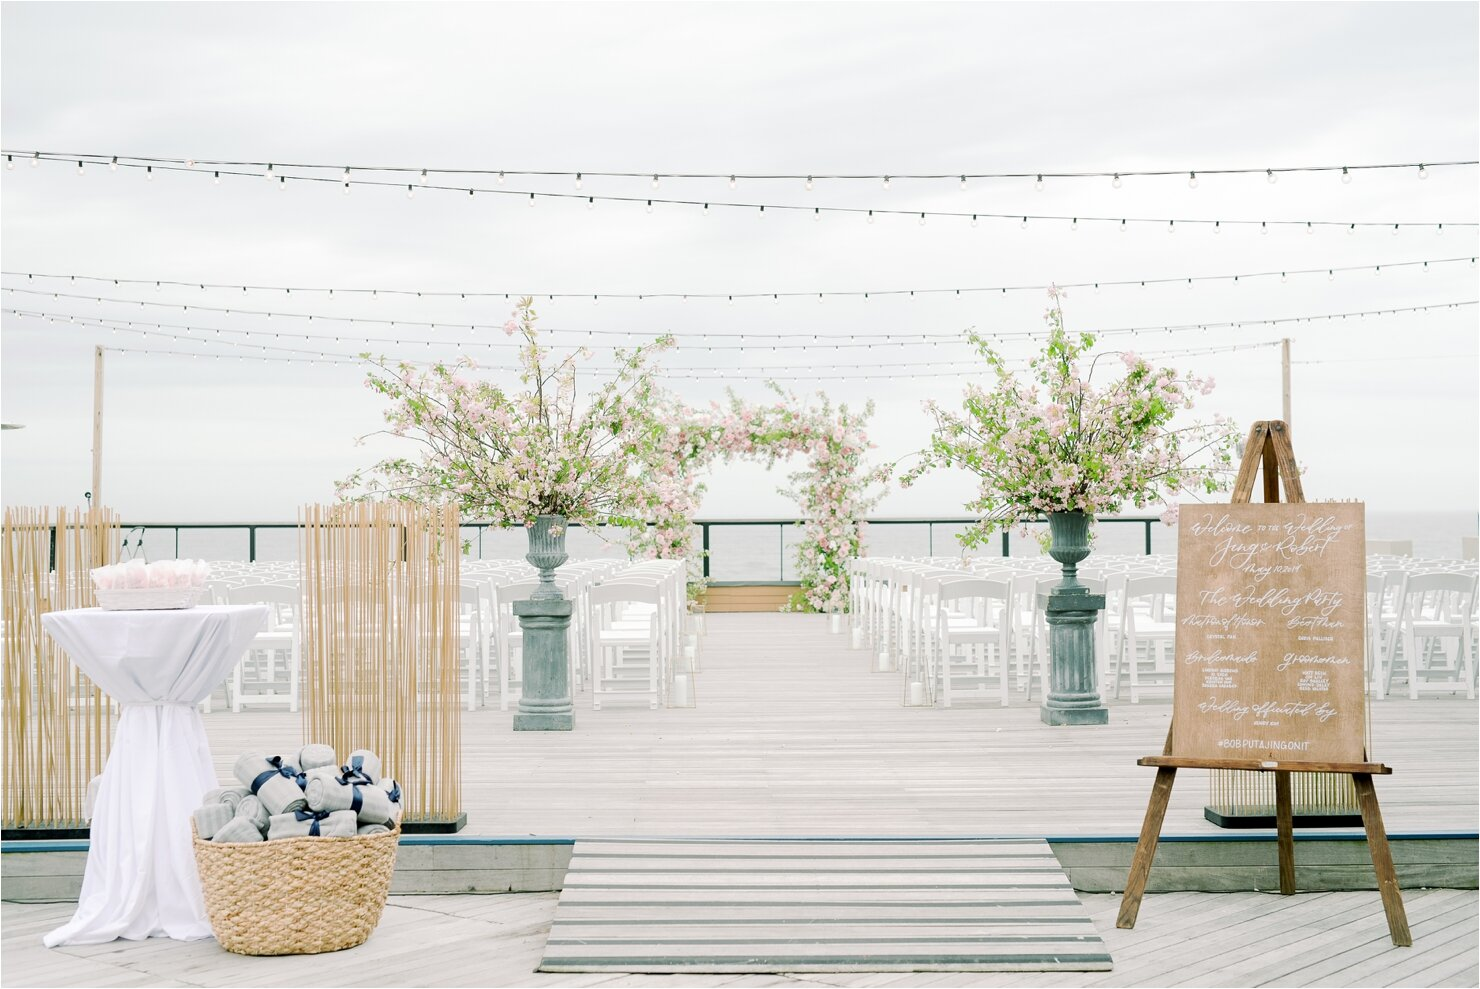 Forward Deck Outside Wedding Ceremony at Gurney's Montauk